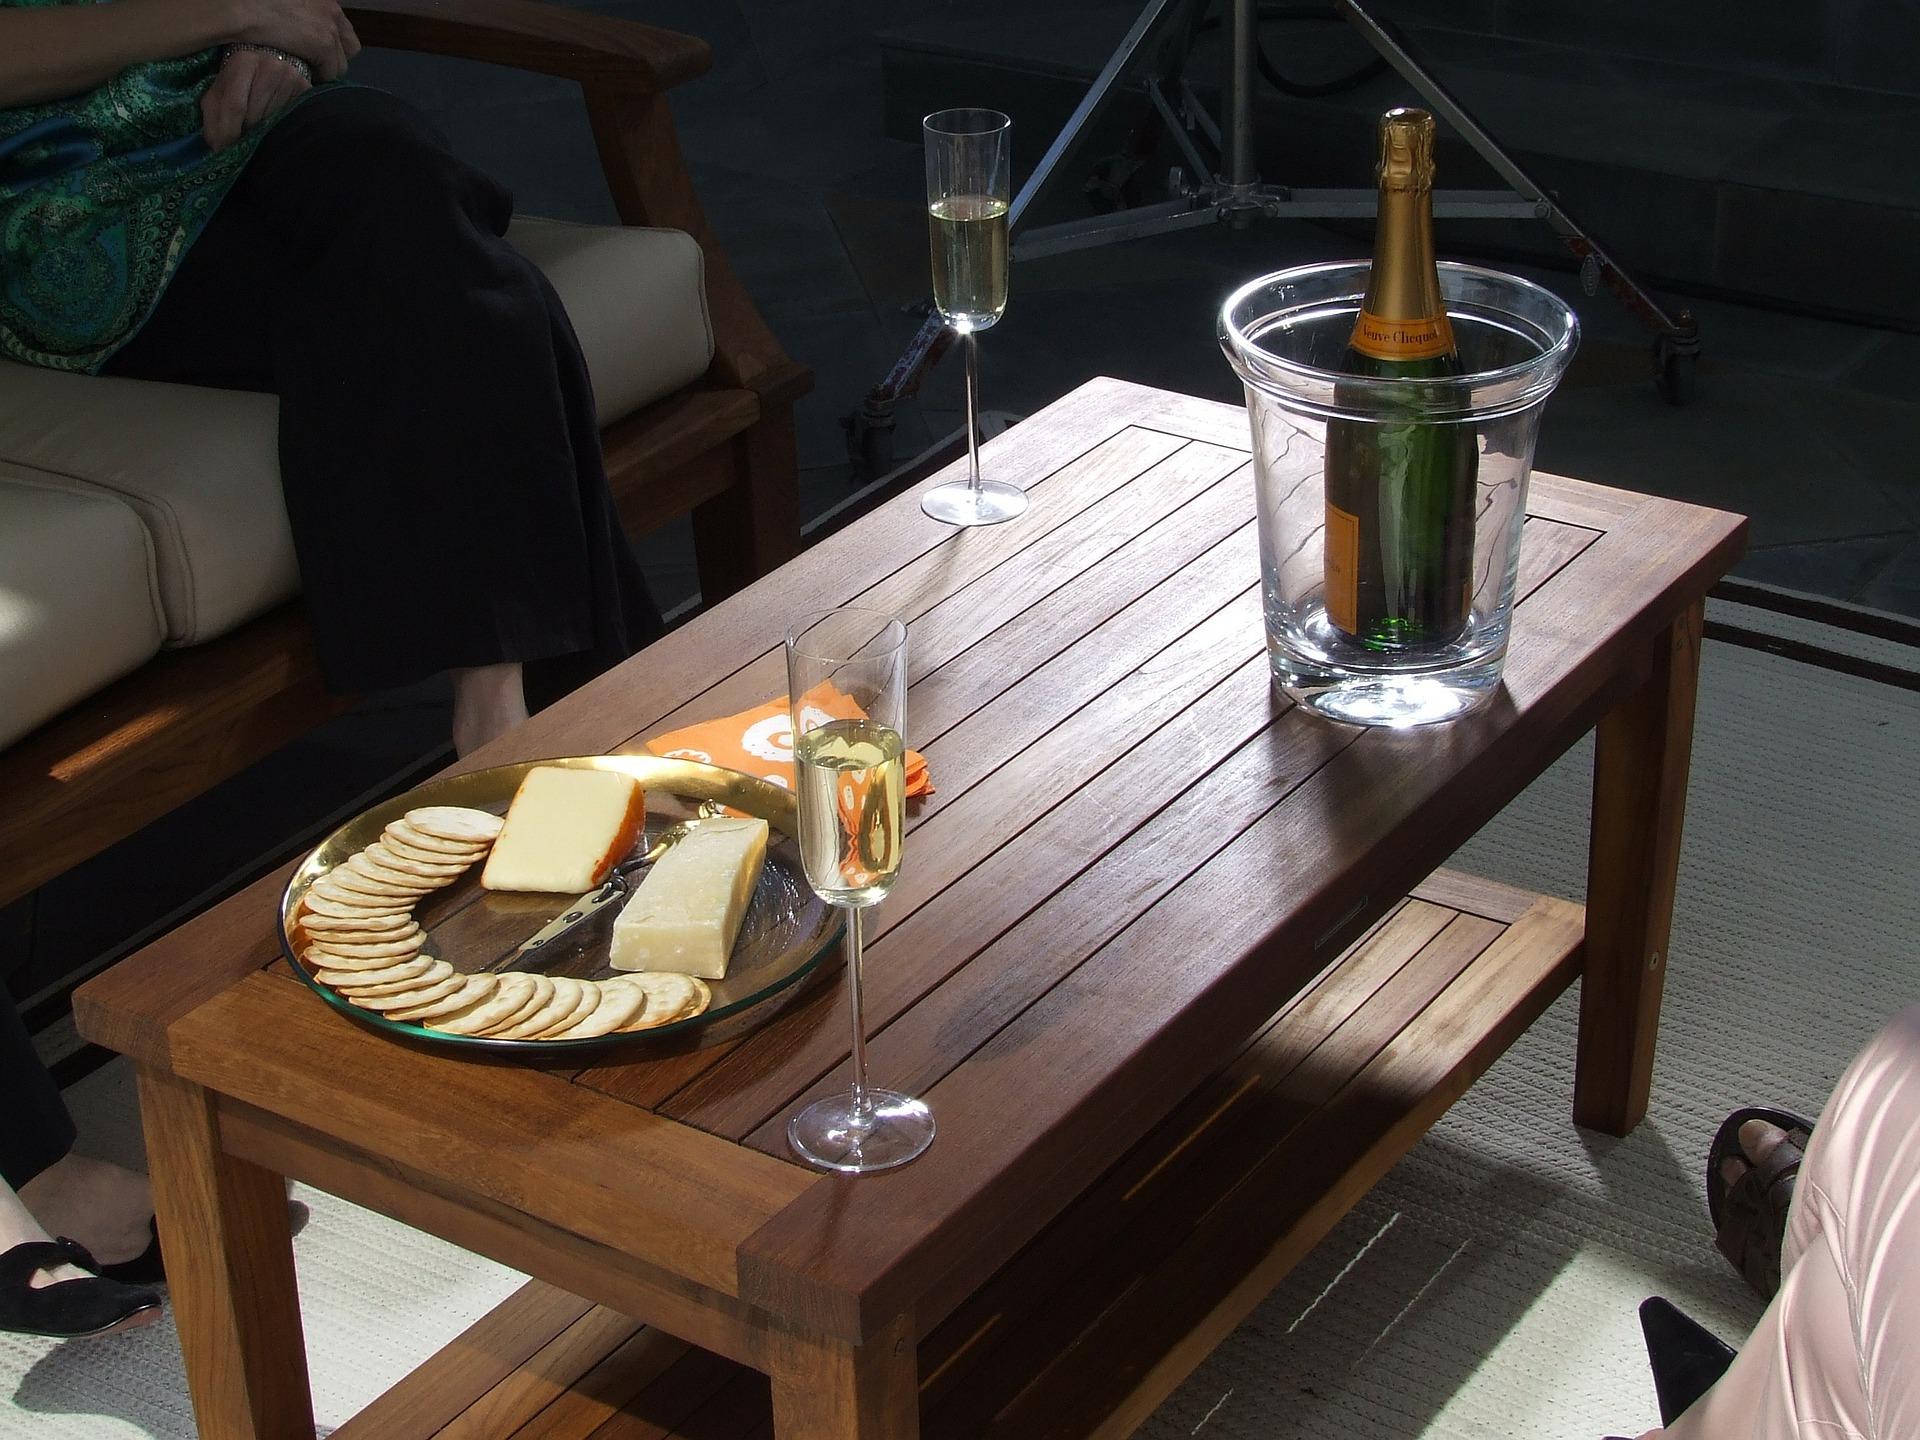 Il tavolo teak: robusto per i vostri pranzi in giardino